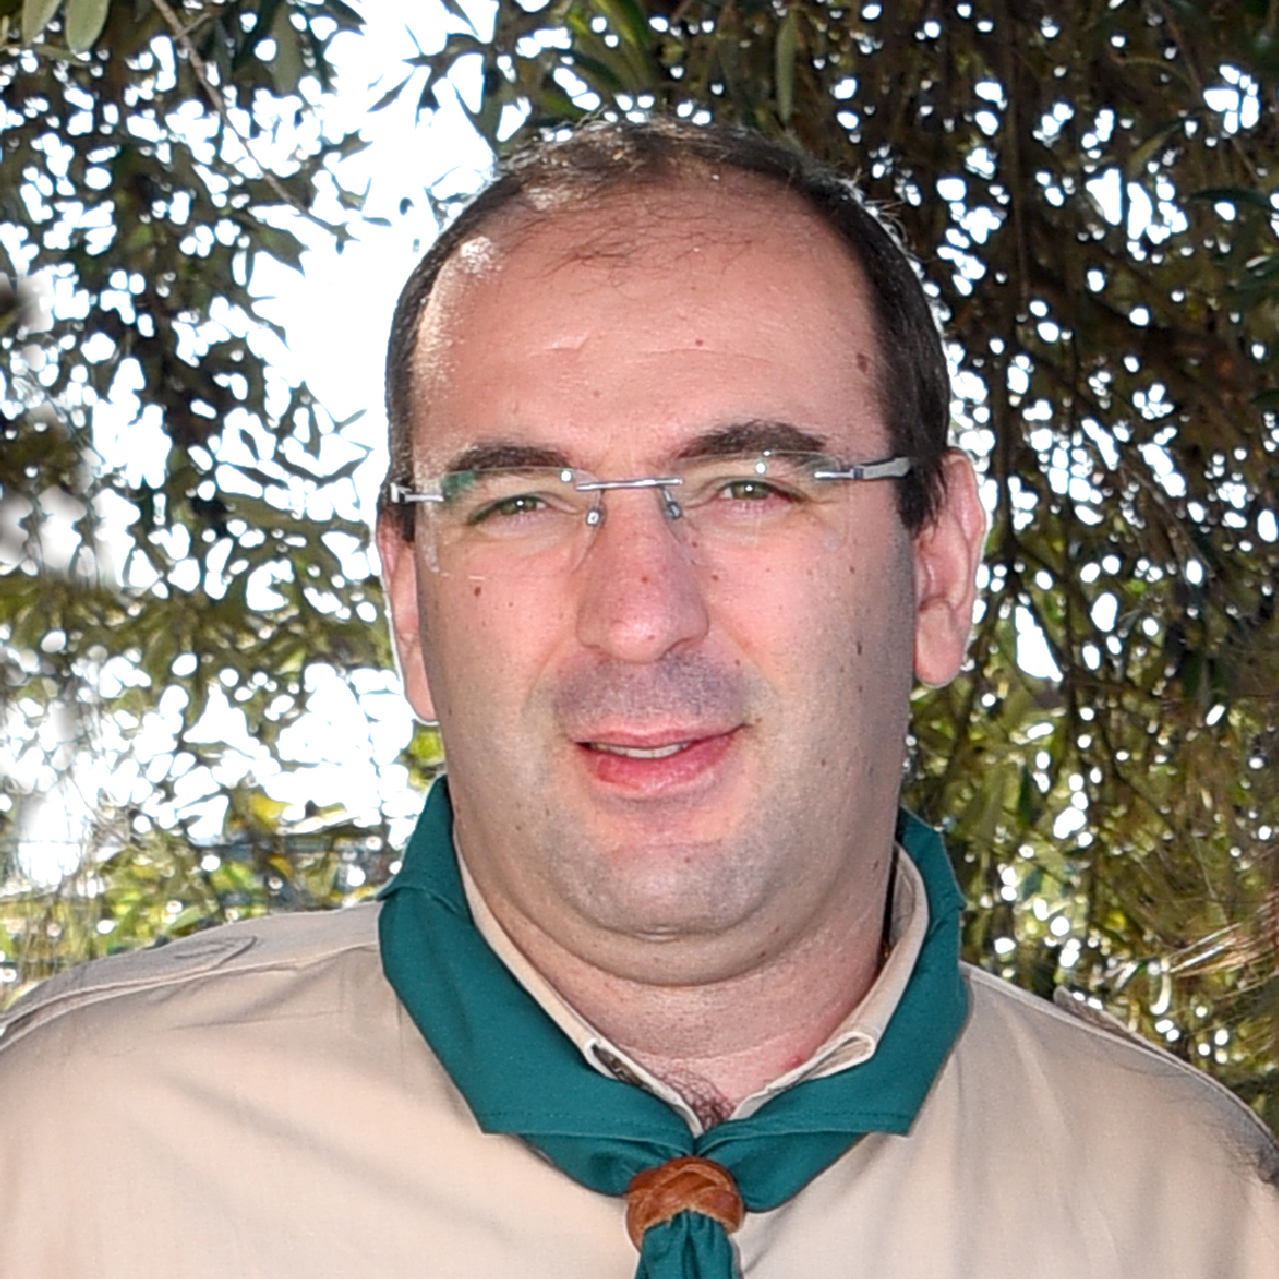 Sérgio Matos